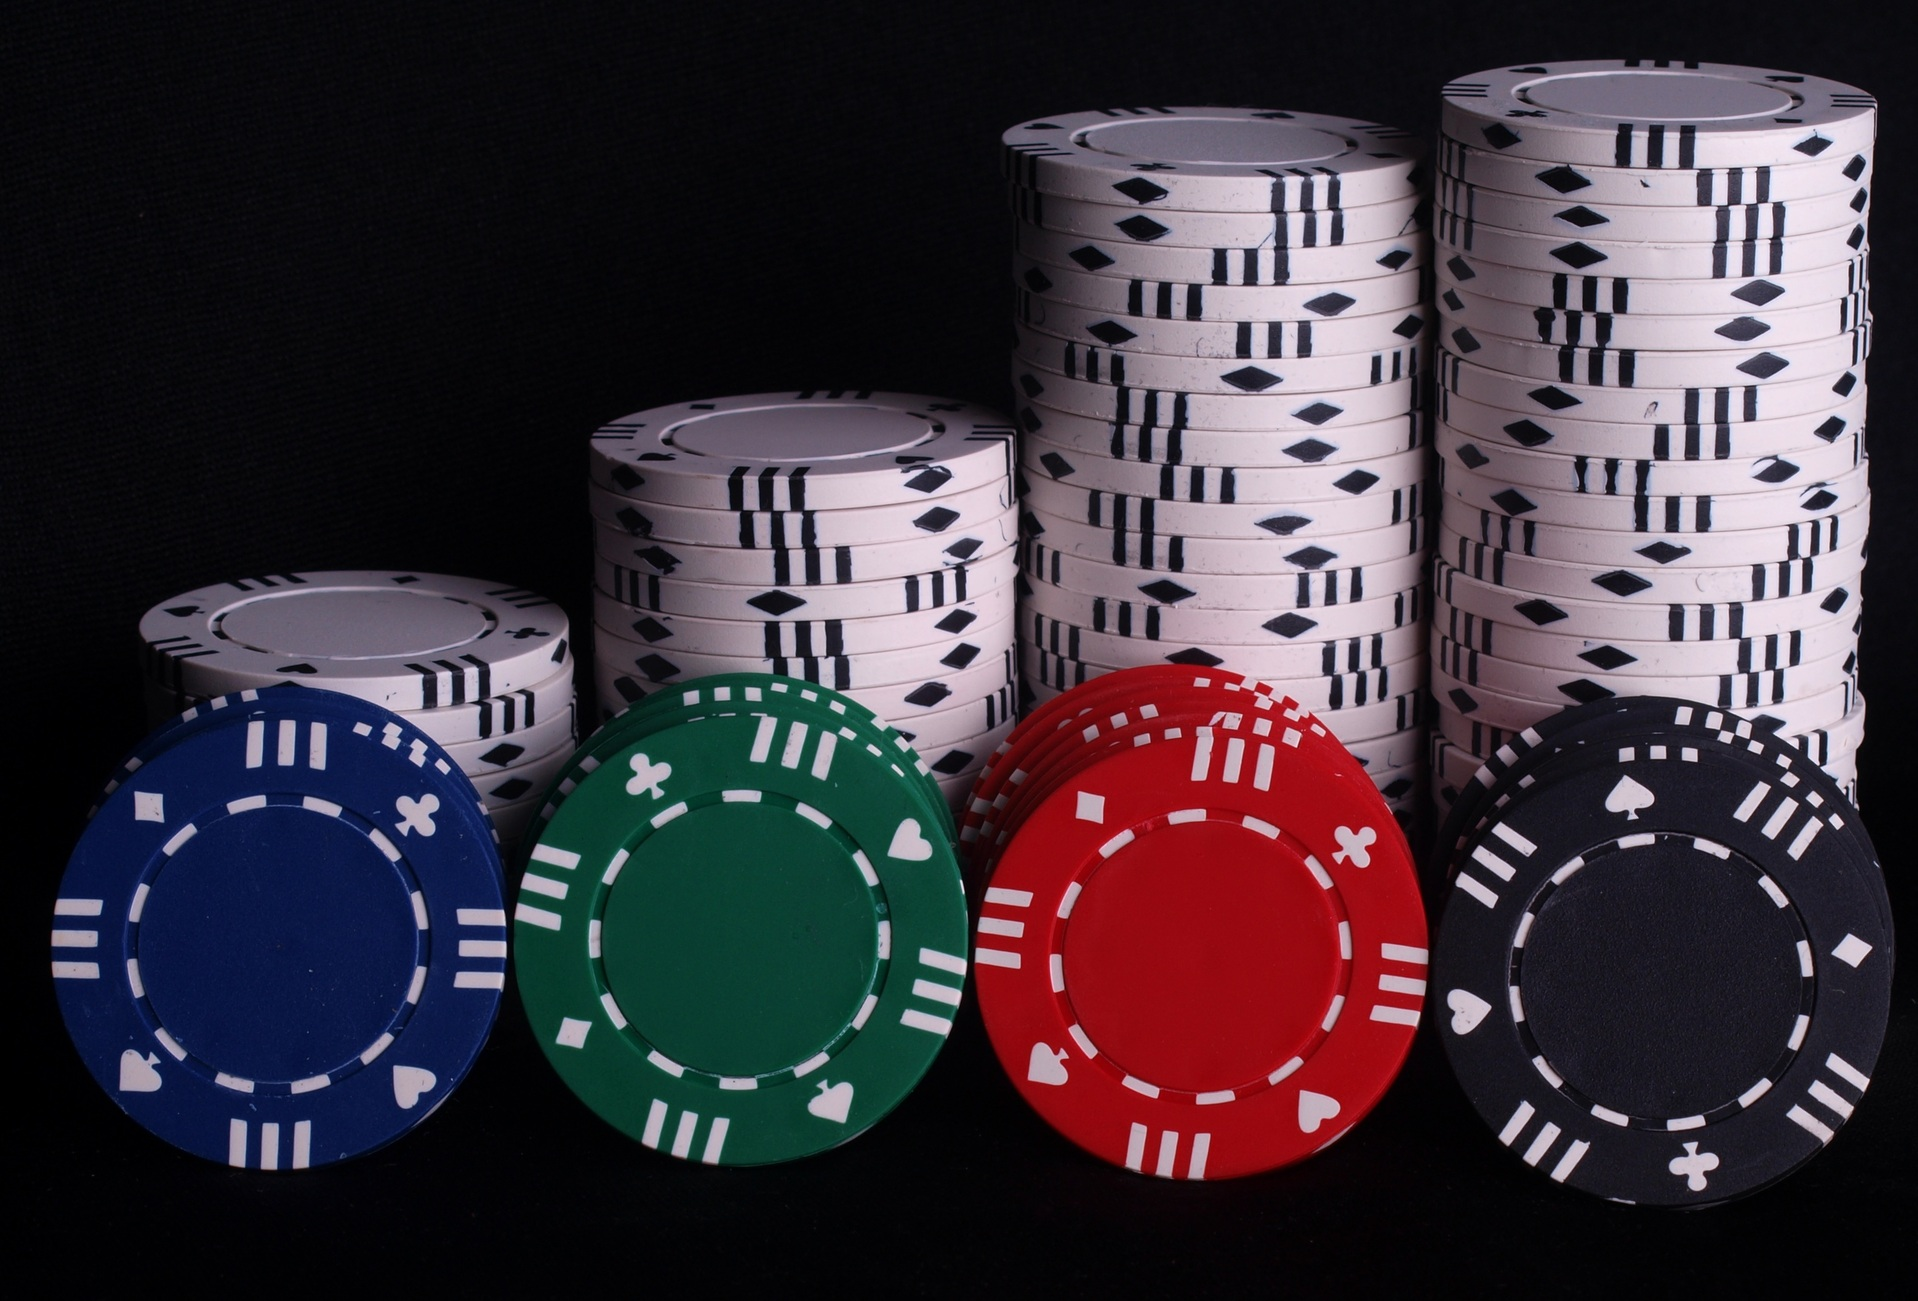 Treasury Poker